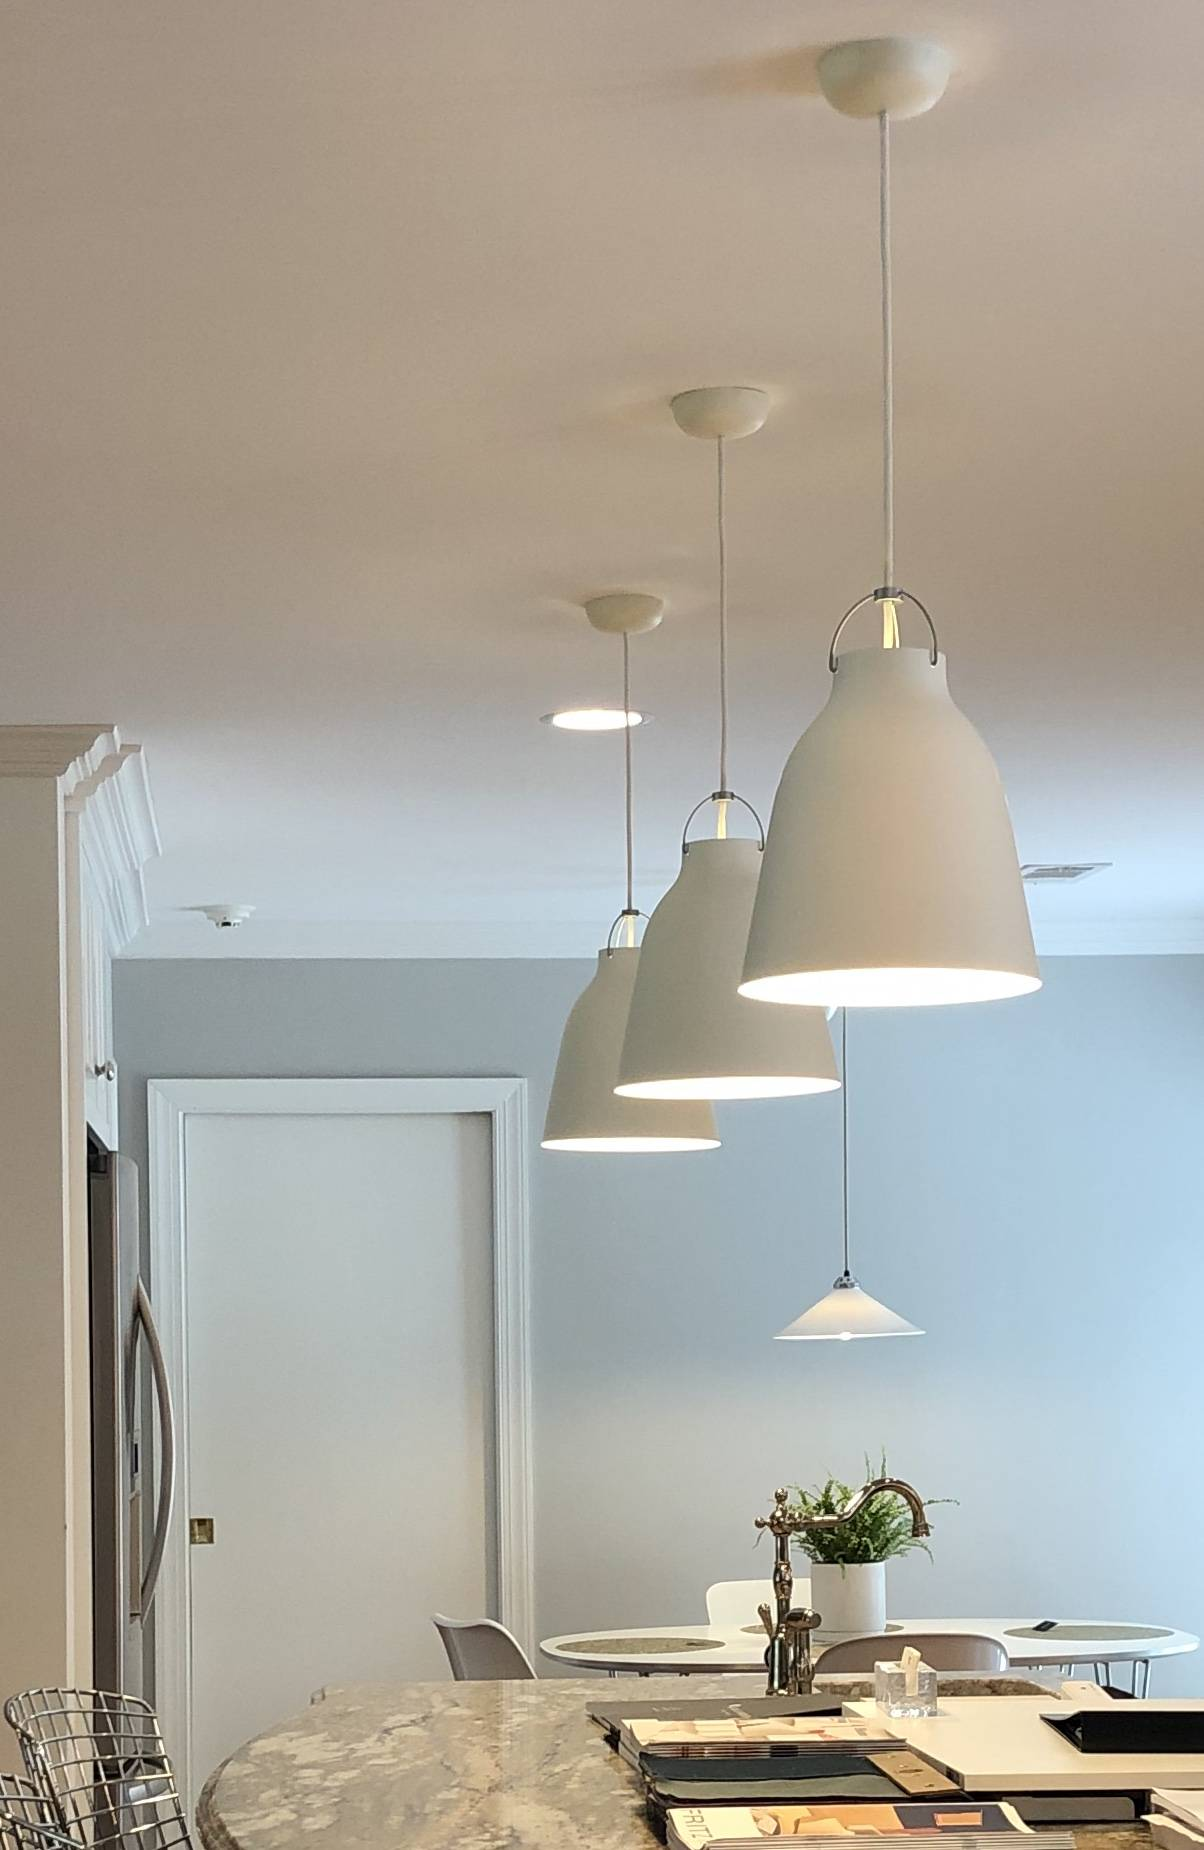 Fritz Hansen Caravaggio Pendant Lights by Cecilie Manz